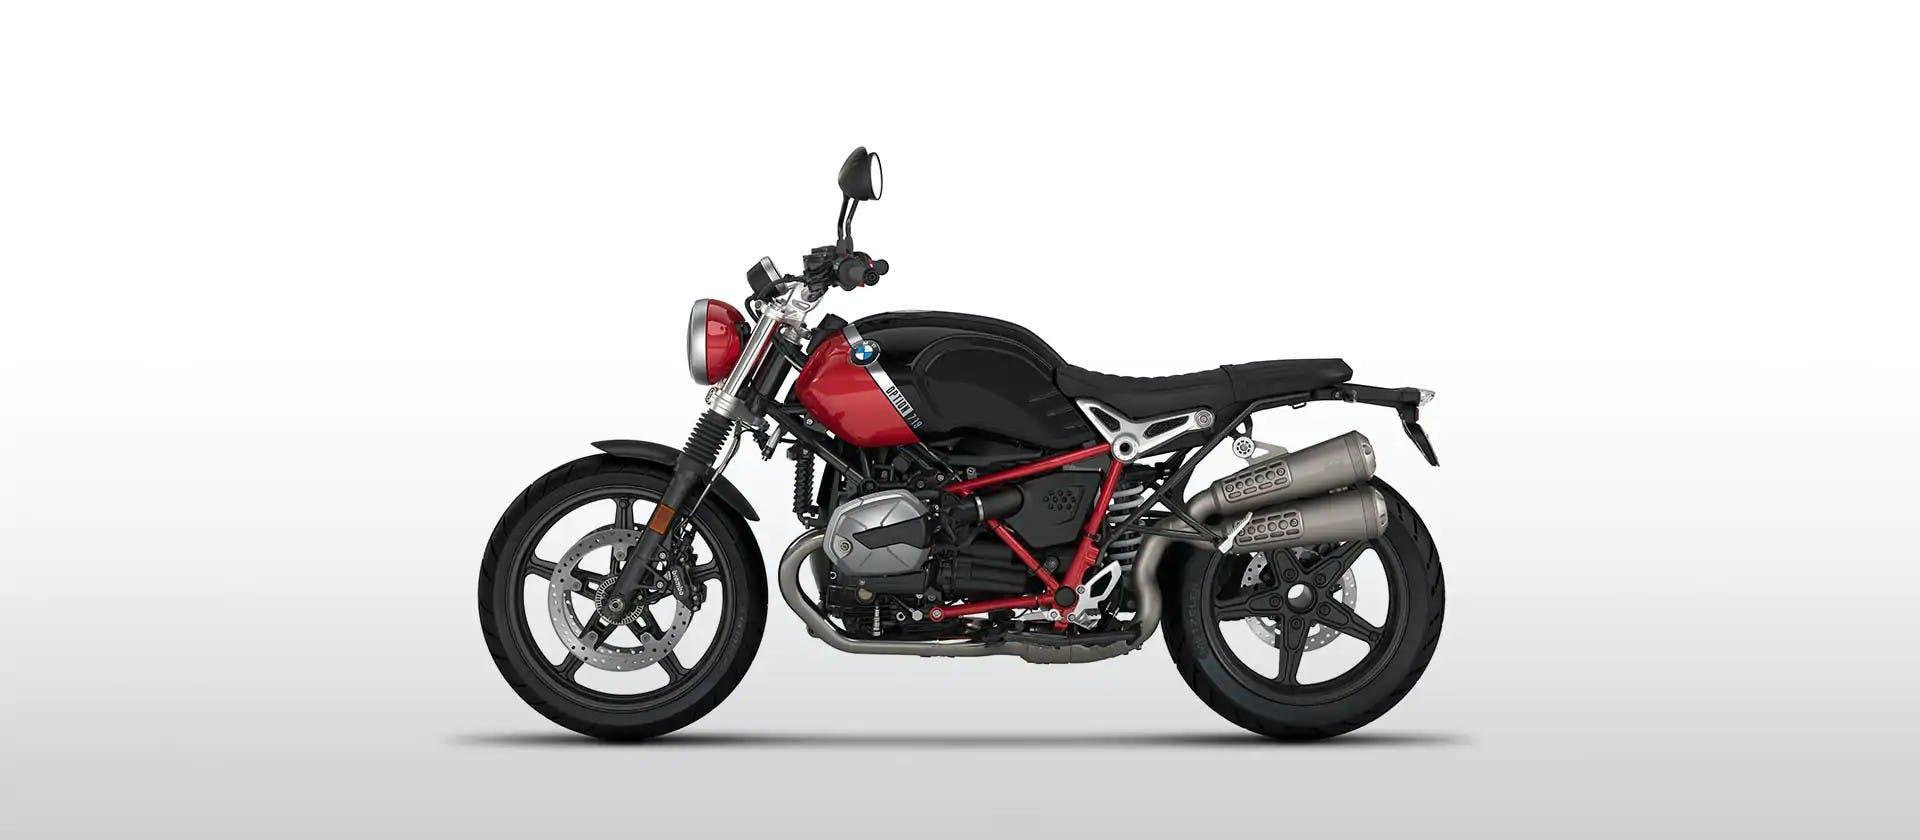 BWM R nineT Scrambler in Option 719 Black Storm Metallic / Racing Red colour